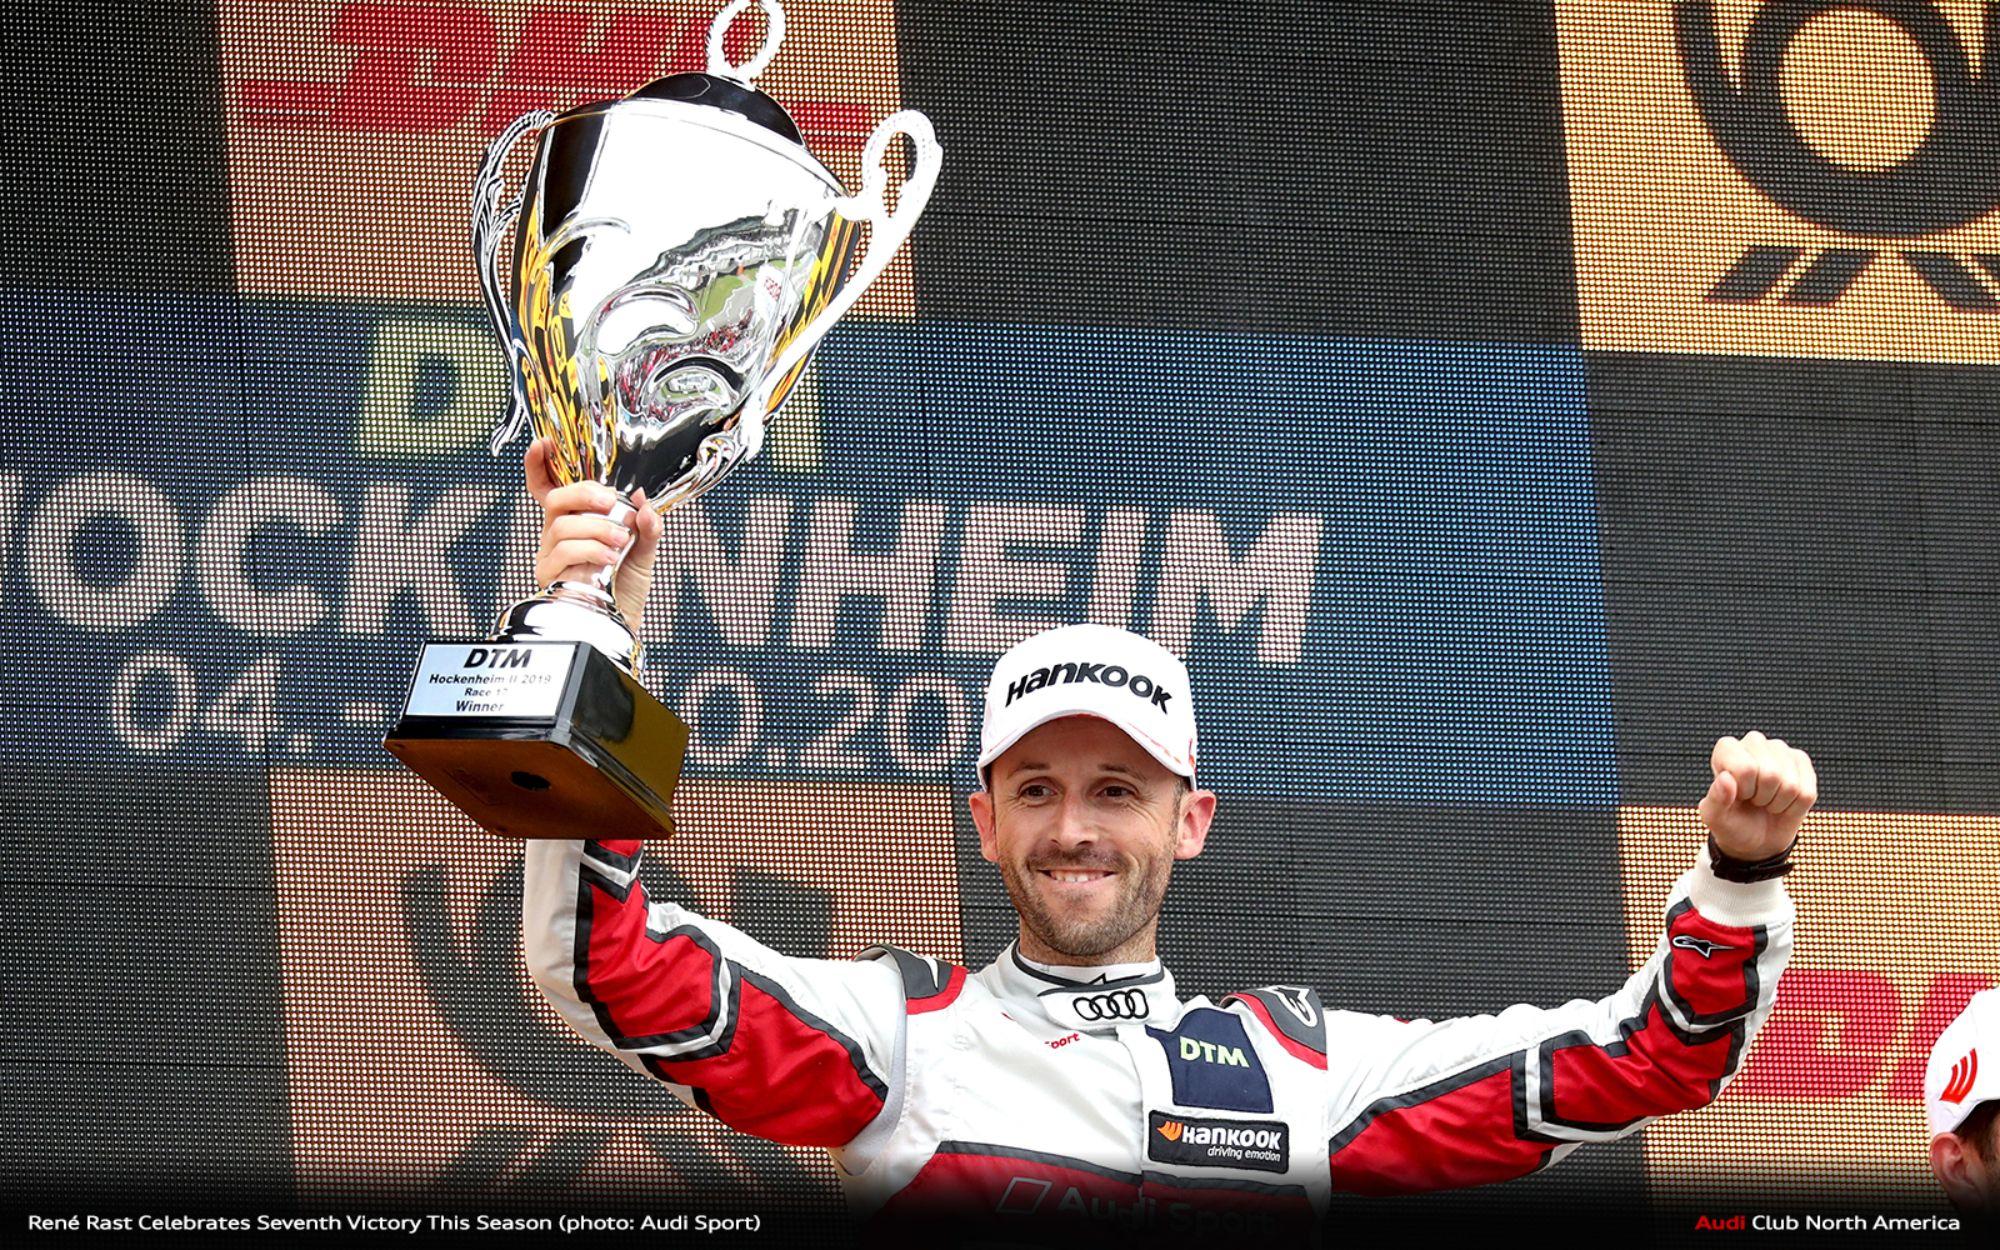 Masterful DTM Champion: René Rast Celebrates Seventh Victory This Season